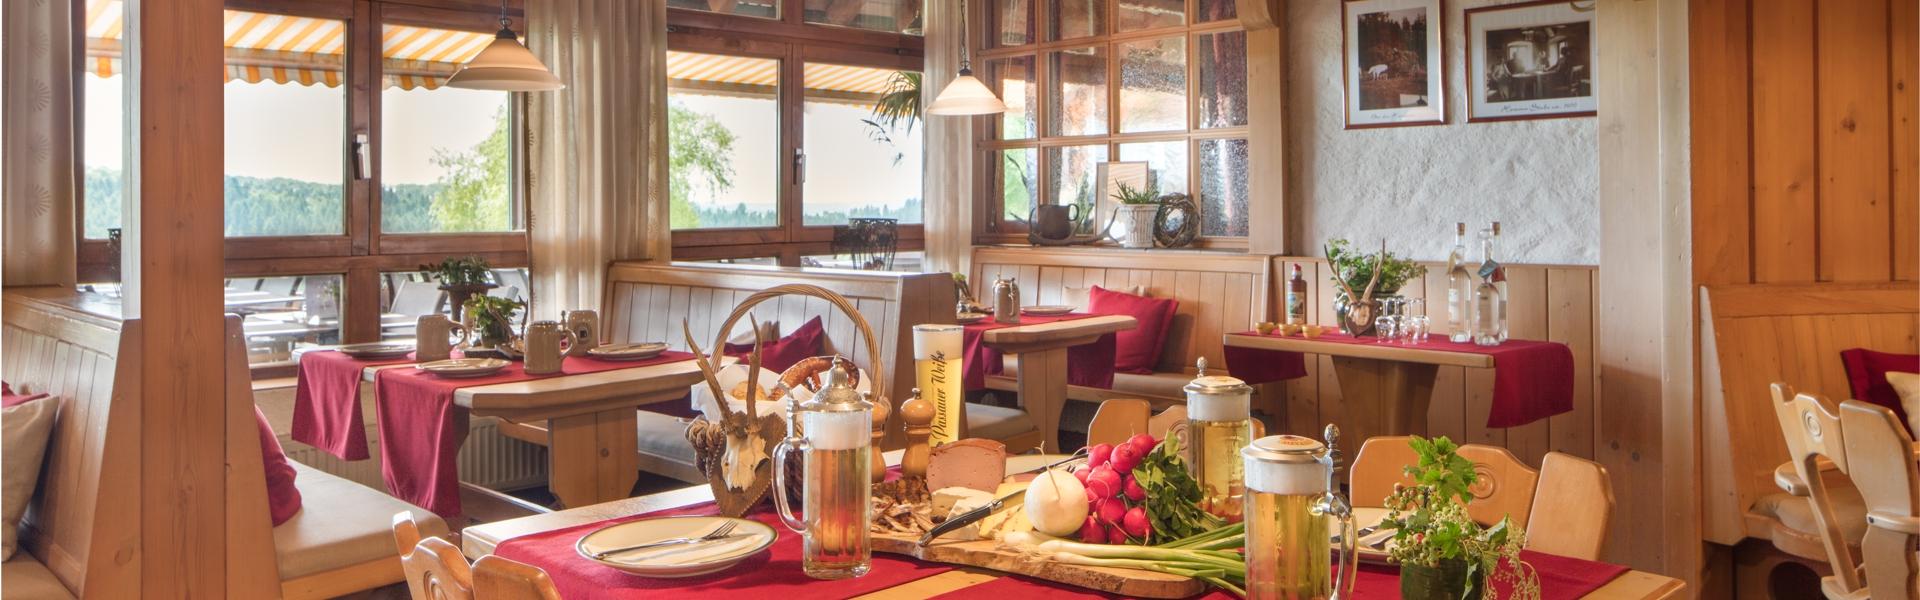 Restaurant Brotzeit Leo´s Restaurant 1920x600_72